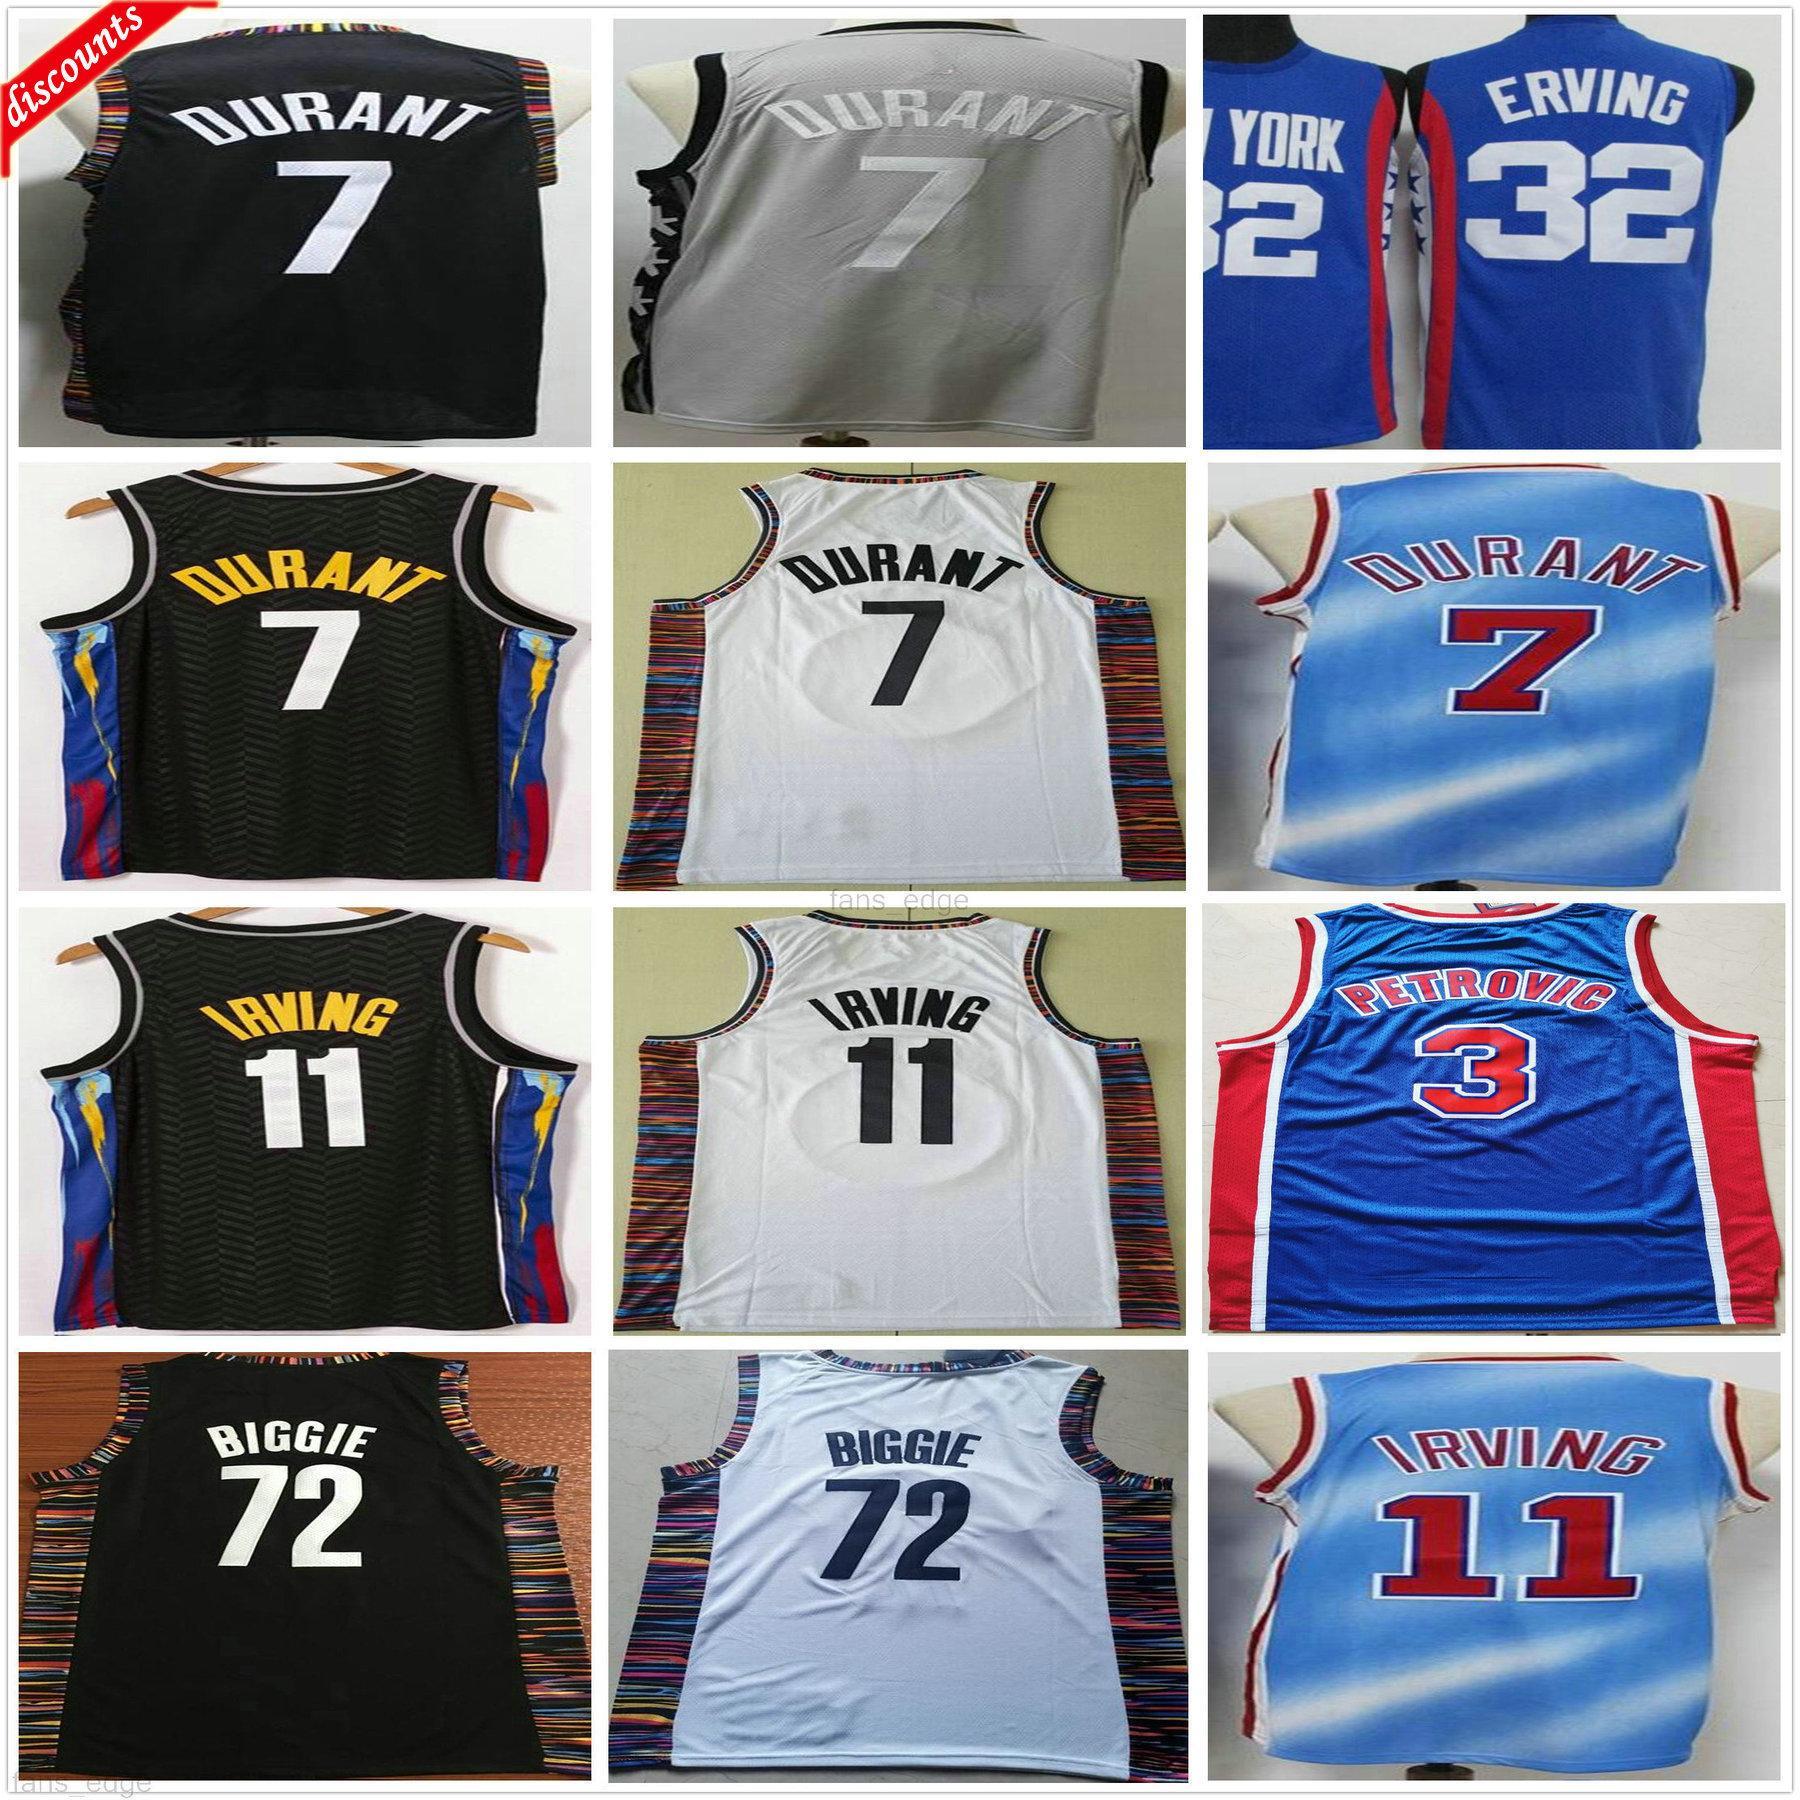 Retro Vintage Classic Drazen 3 Petrovic Julius 32 Ernt 72 Biggie Basketball Trikots Großhandel Günstige Kevin 7 Durant Irving Jersey